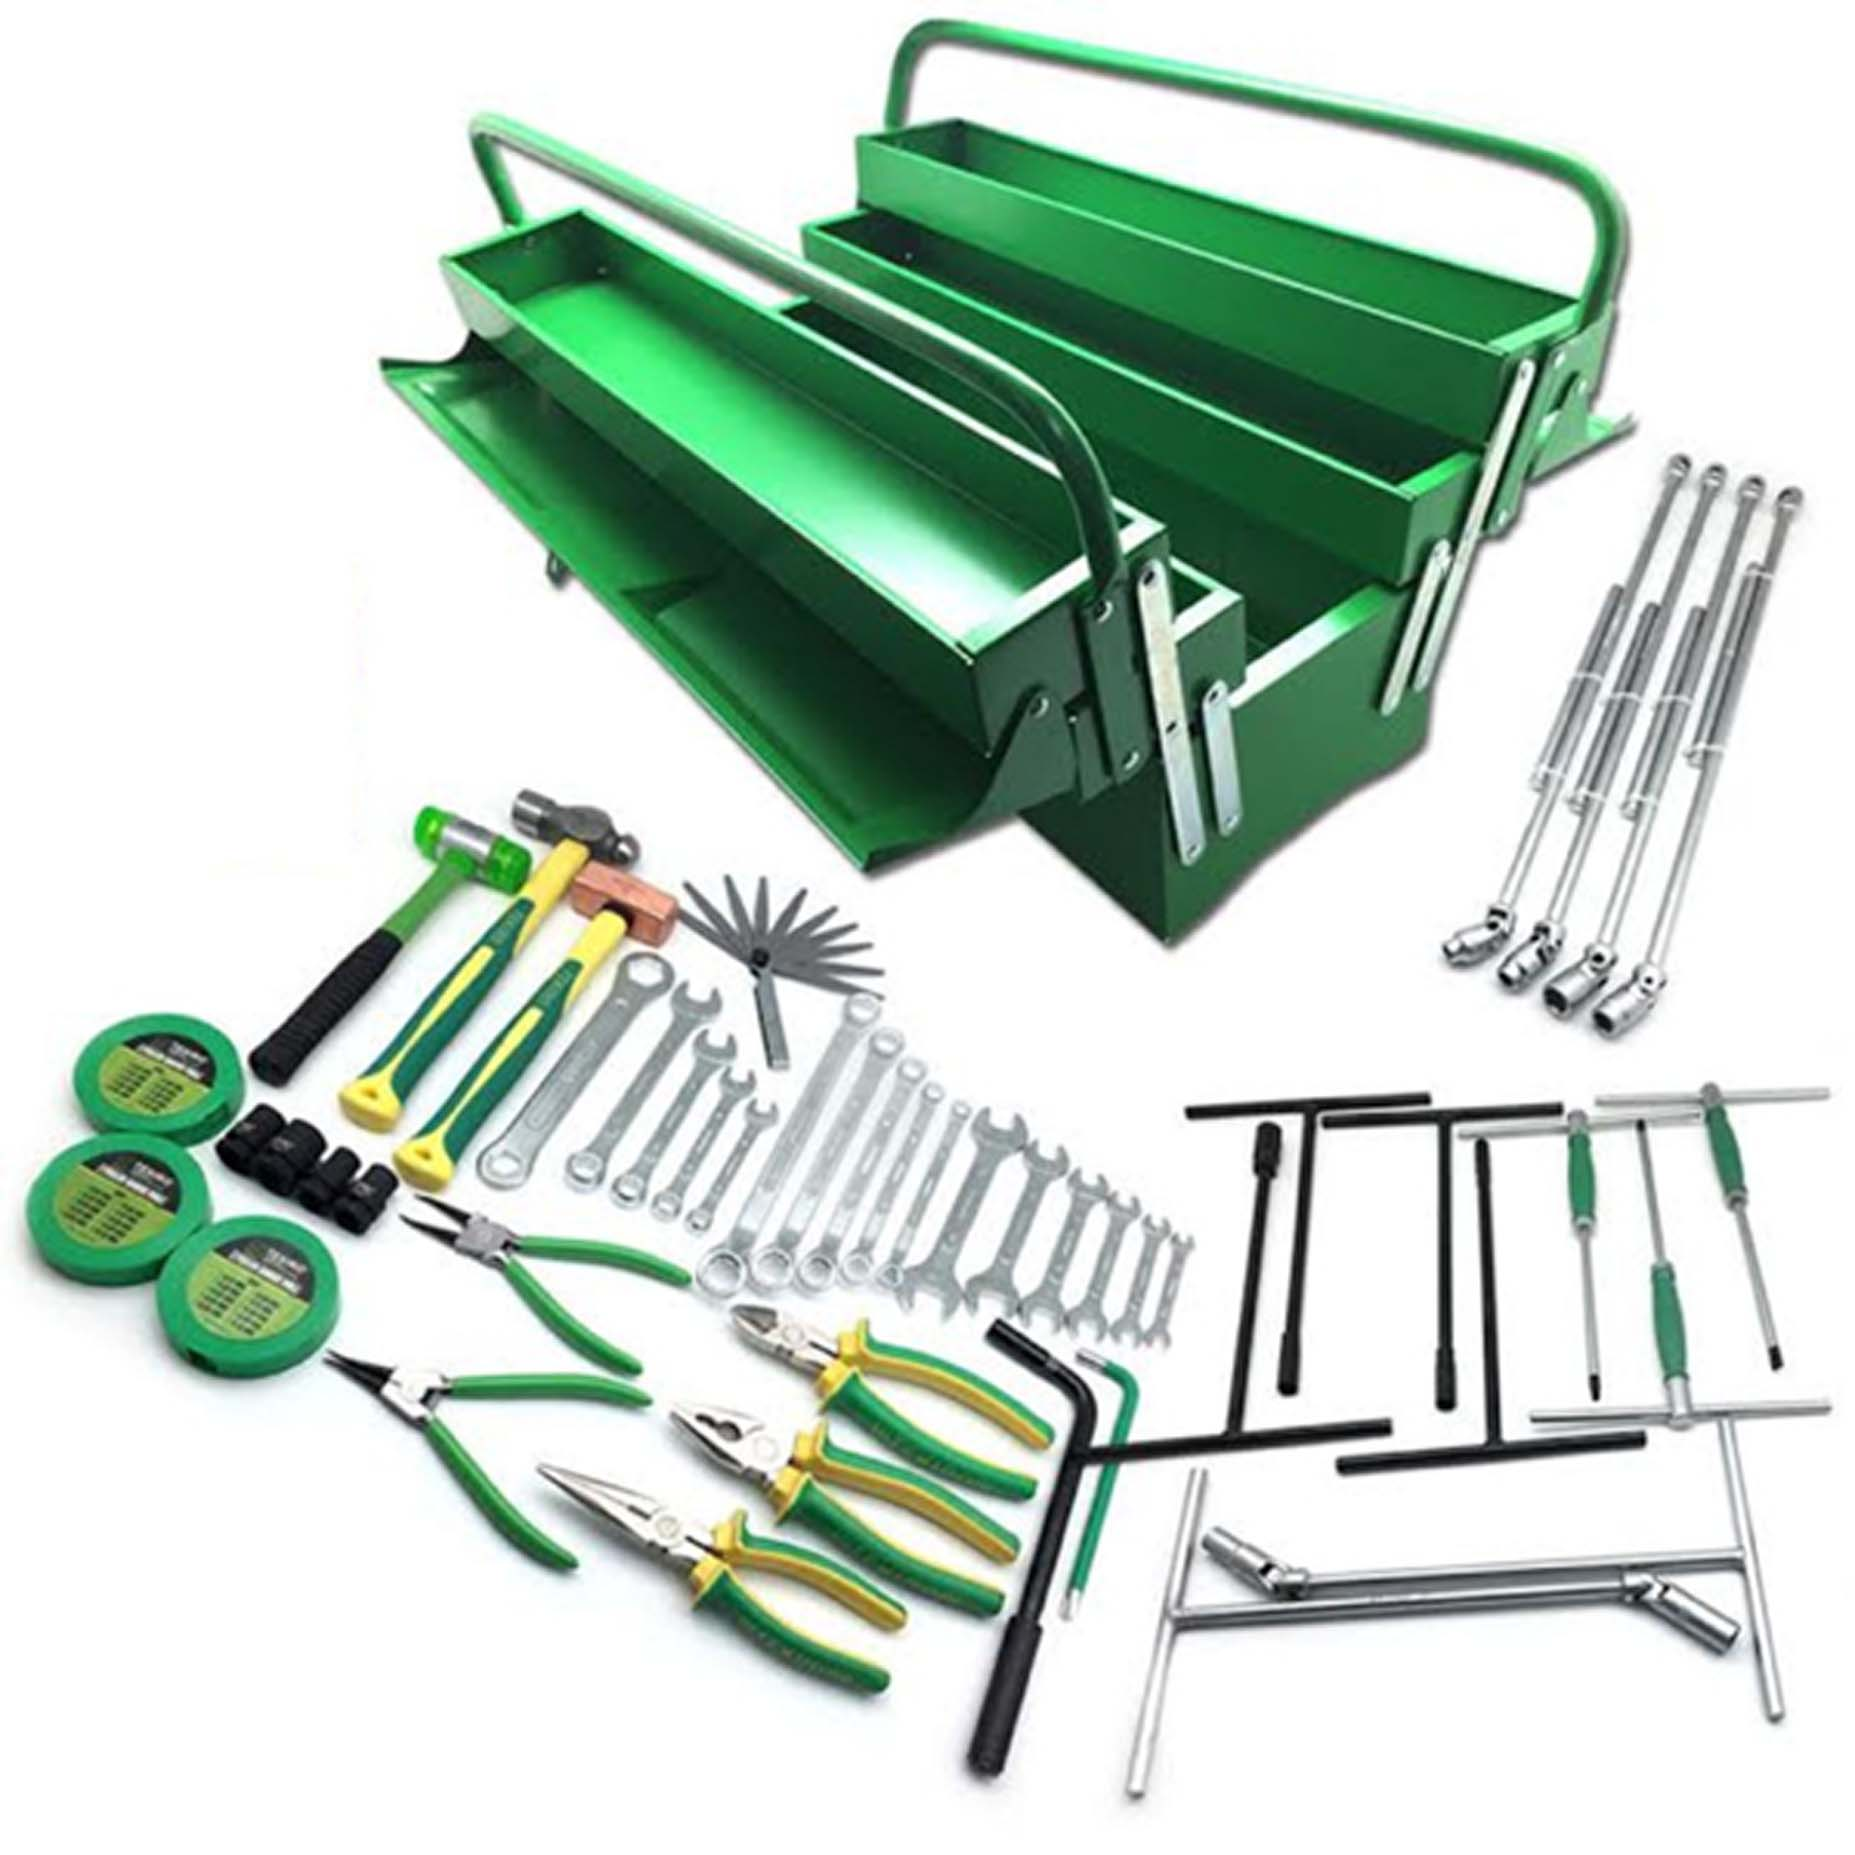 Harga Tekiro Tool Set Mekanik Automotive 50 Pcs Metal Box Perkakas Stanley 5 Tray Cantilever Spesifikasi